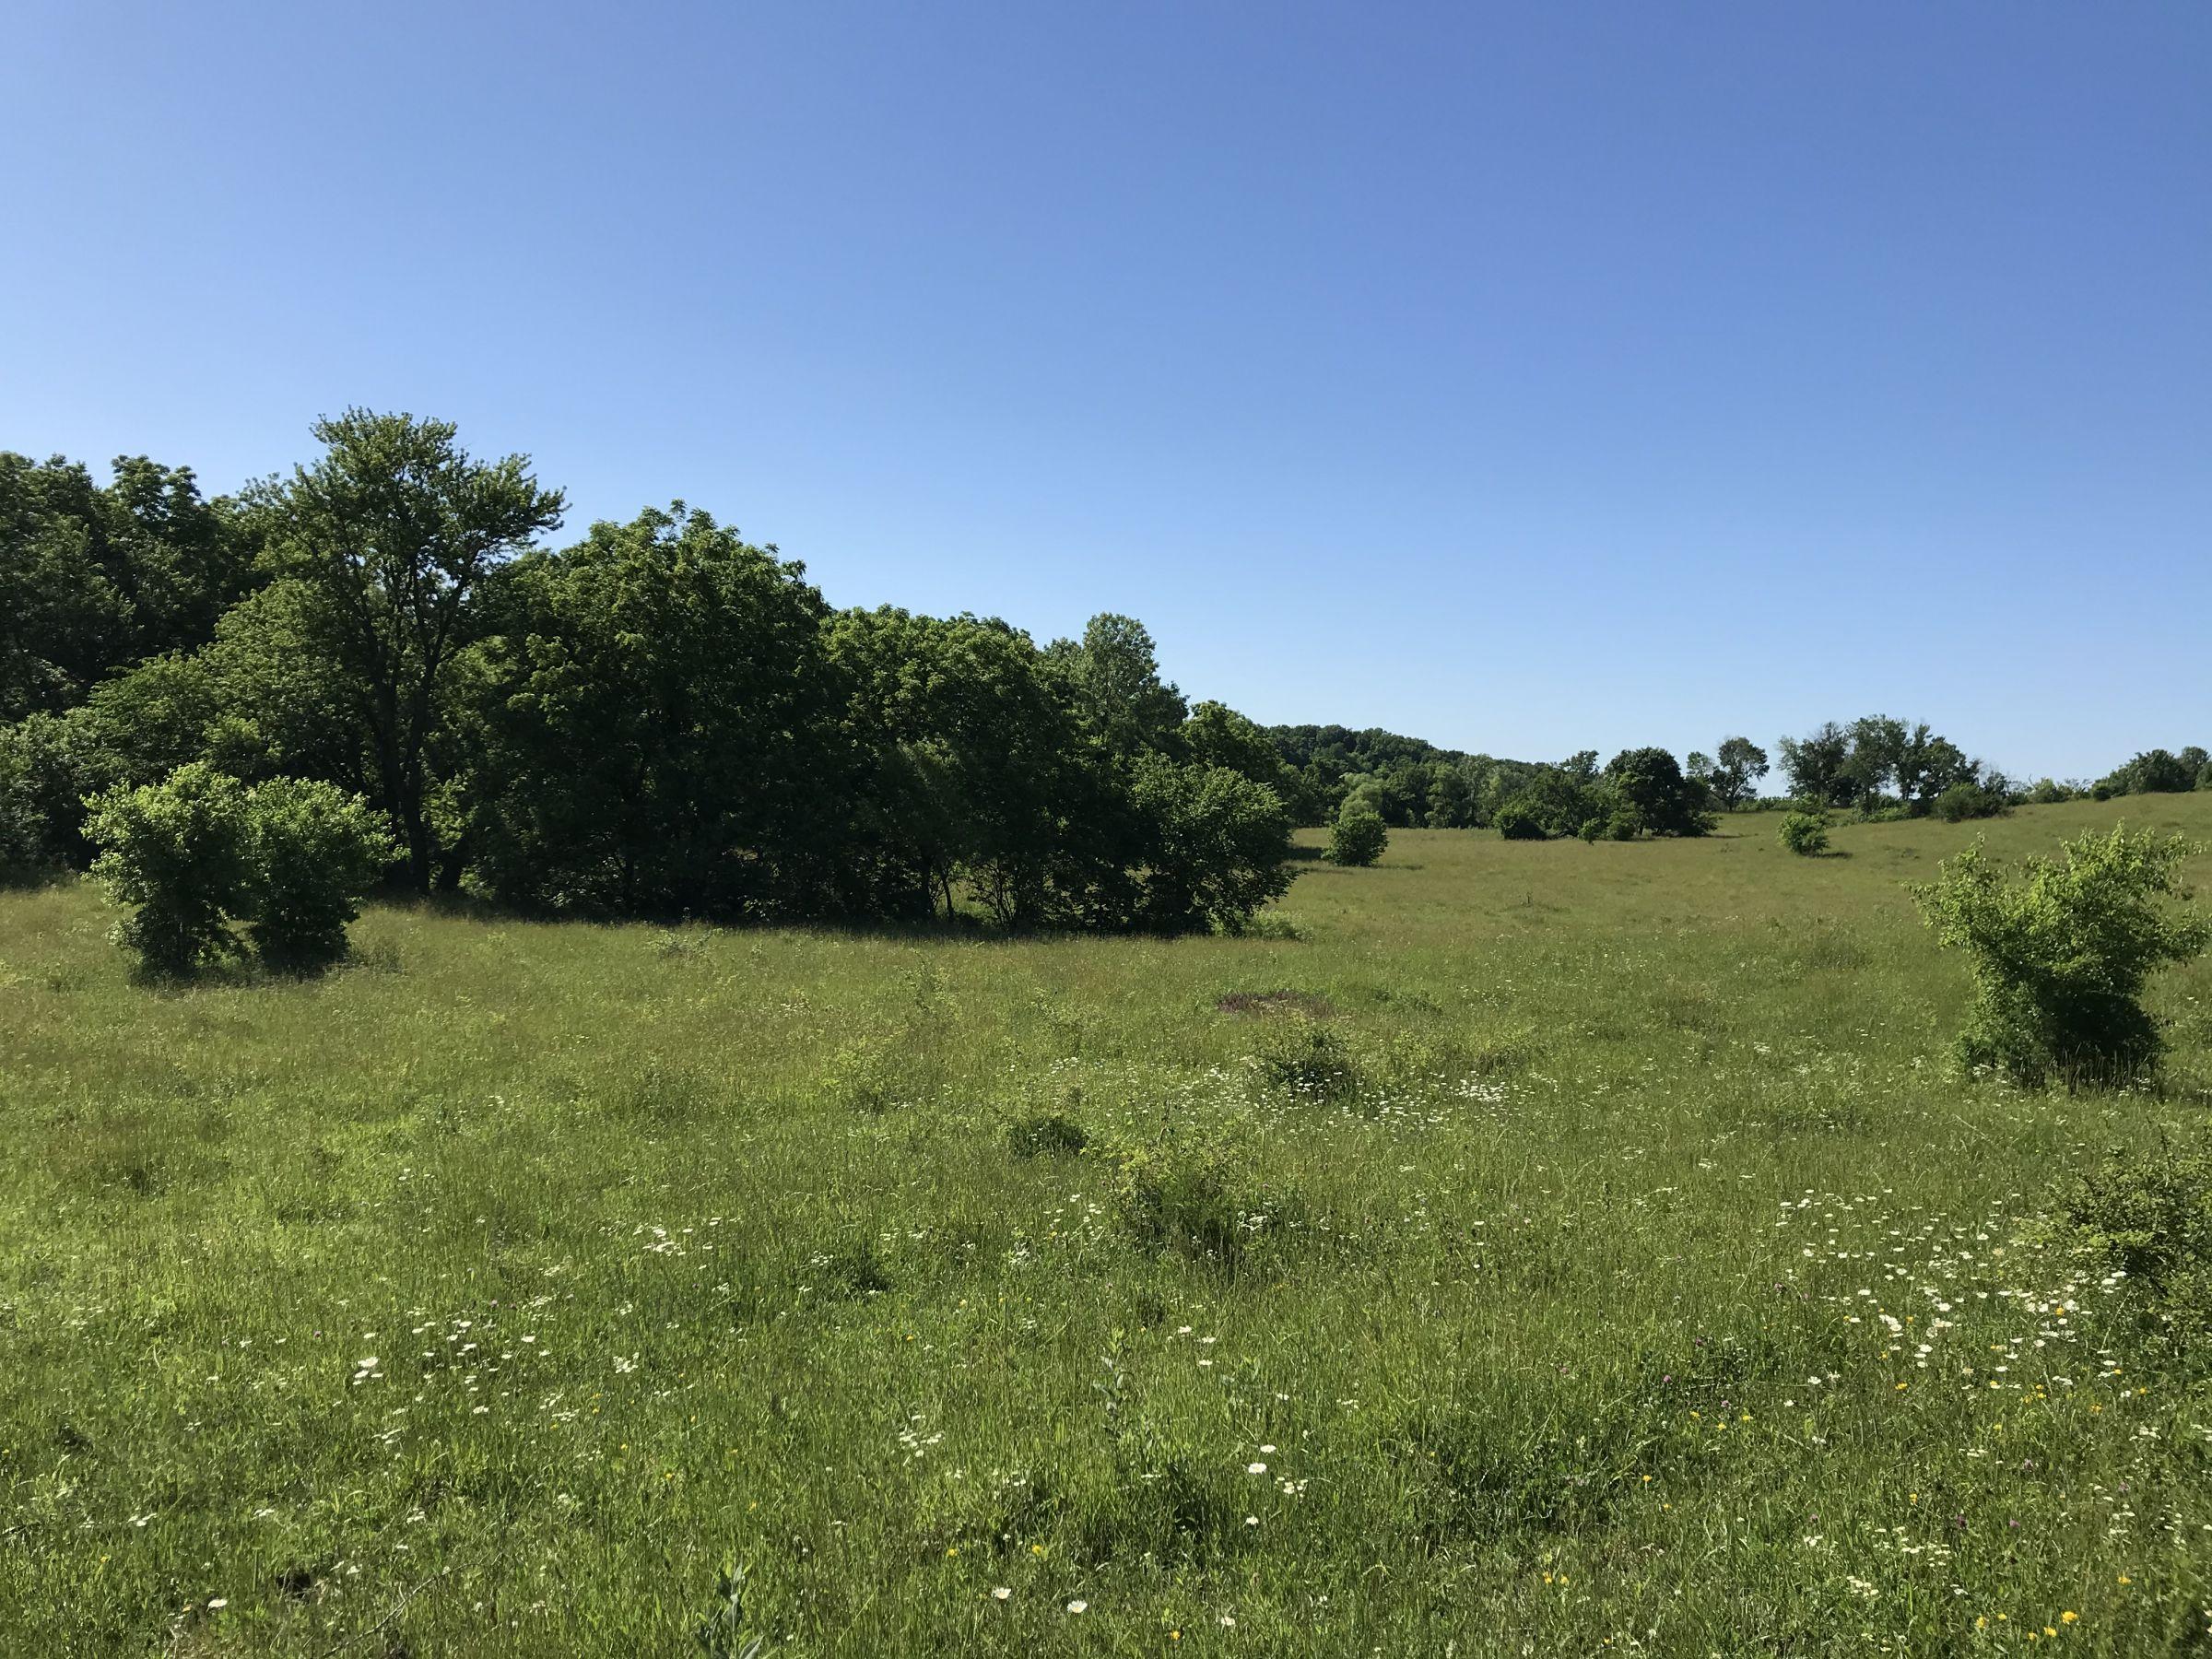 land-warren-county-iowa-60-acres-listing-number-15033-1-2020-06-14-151752.JPG